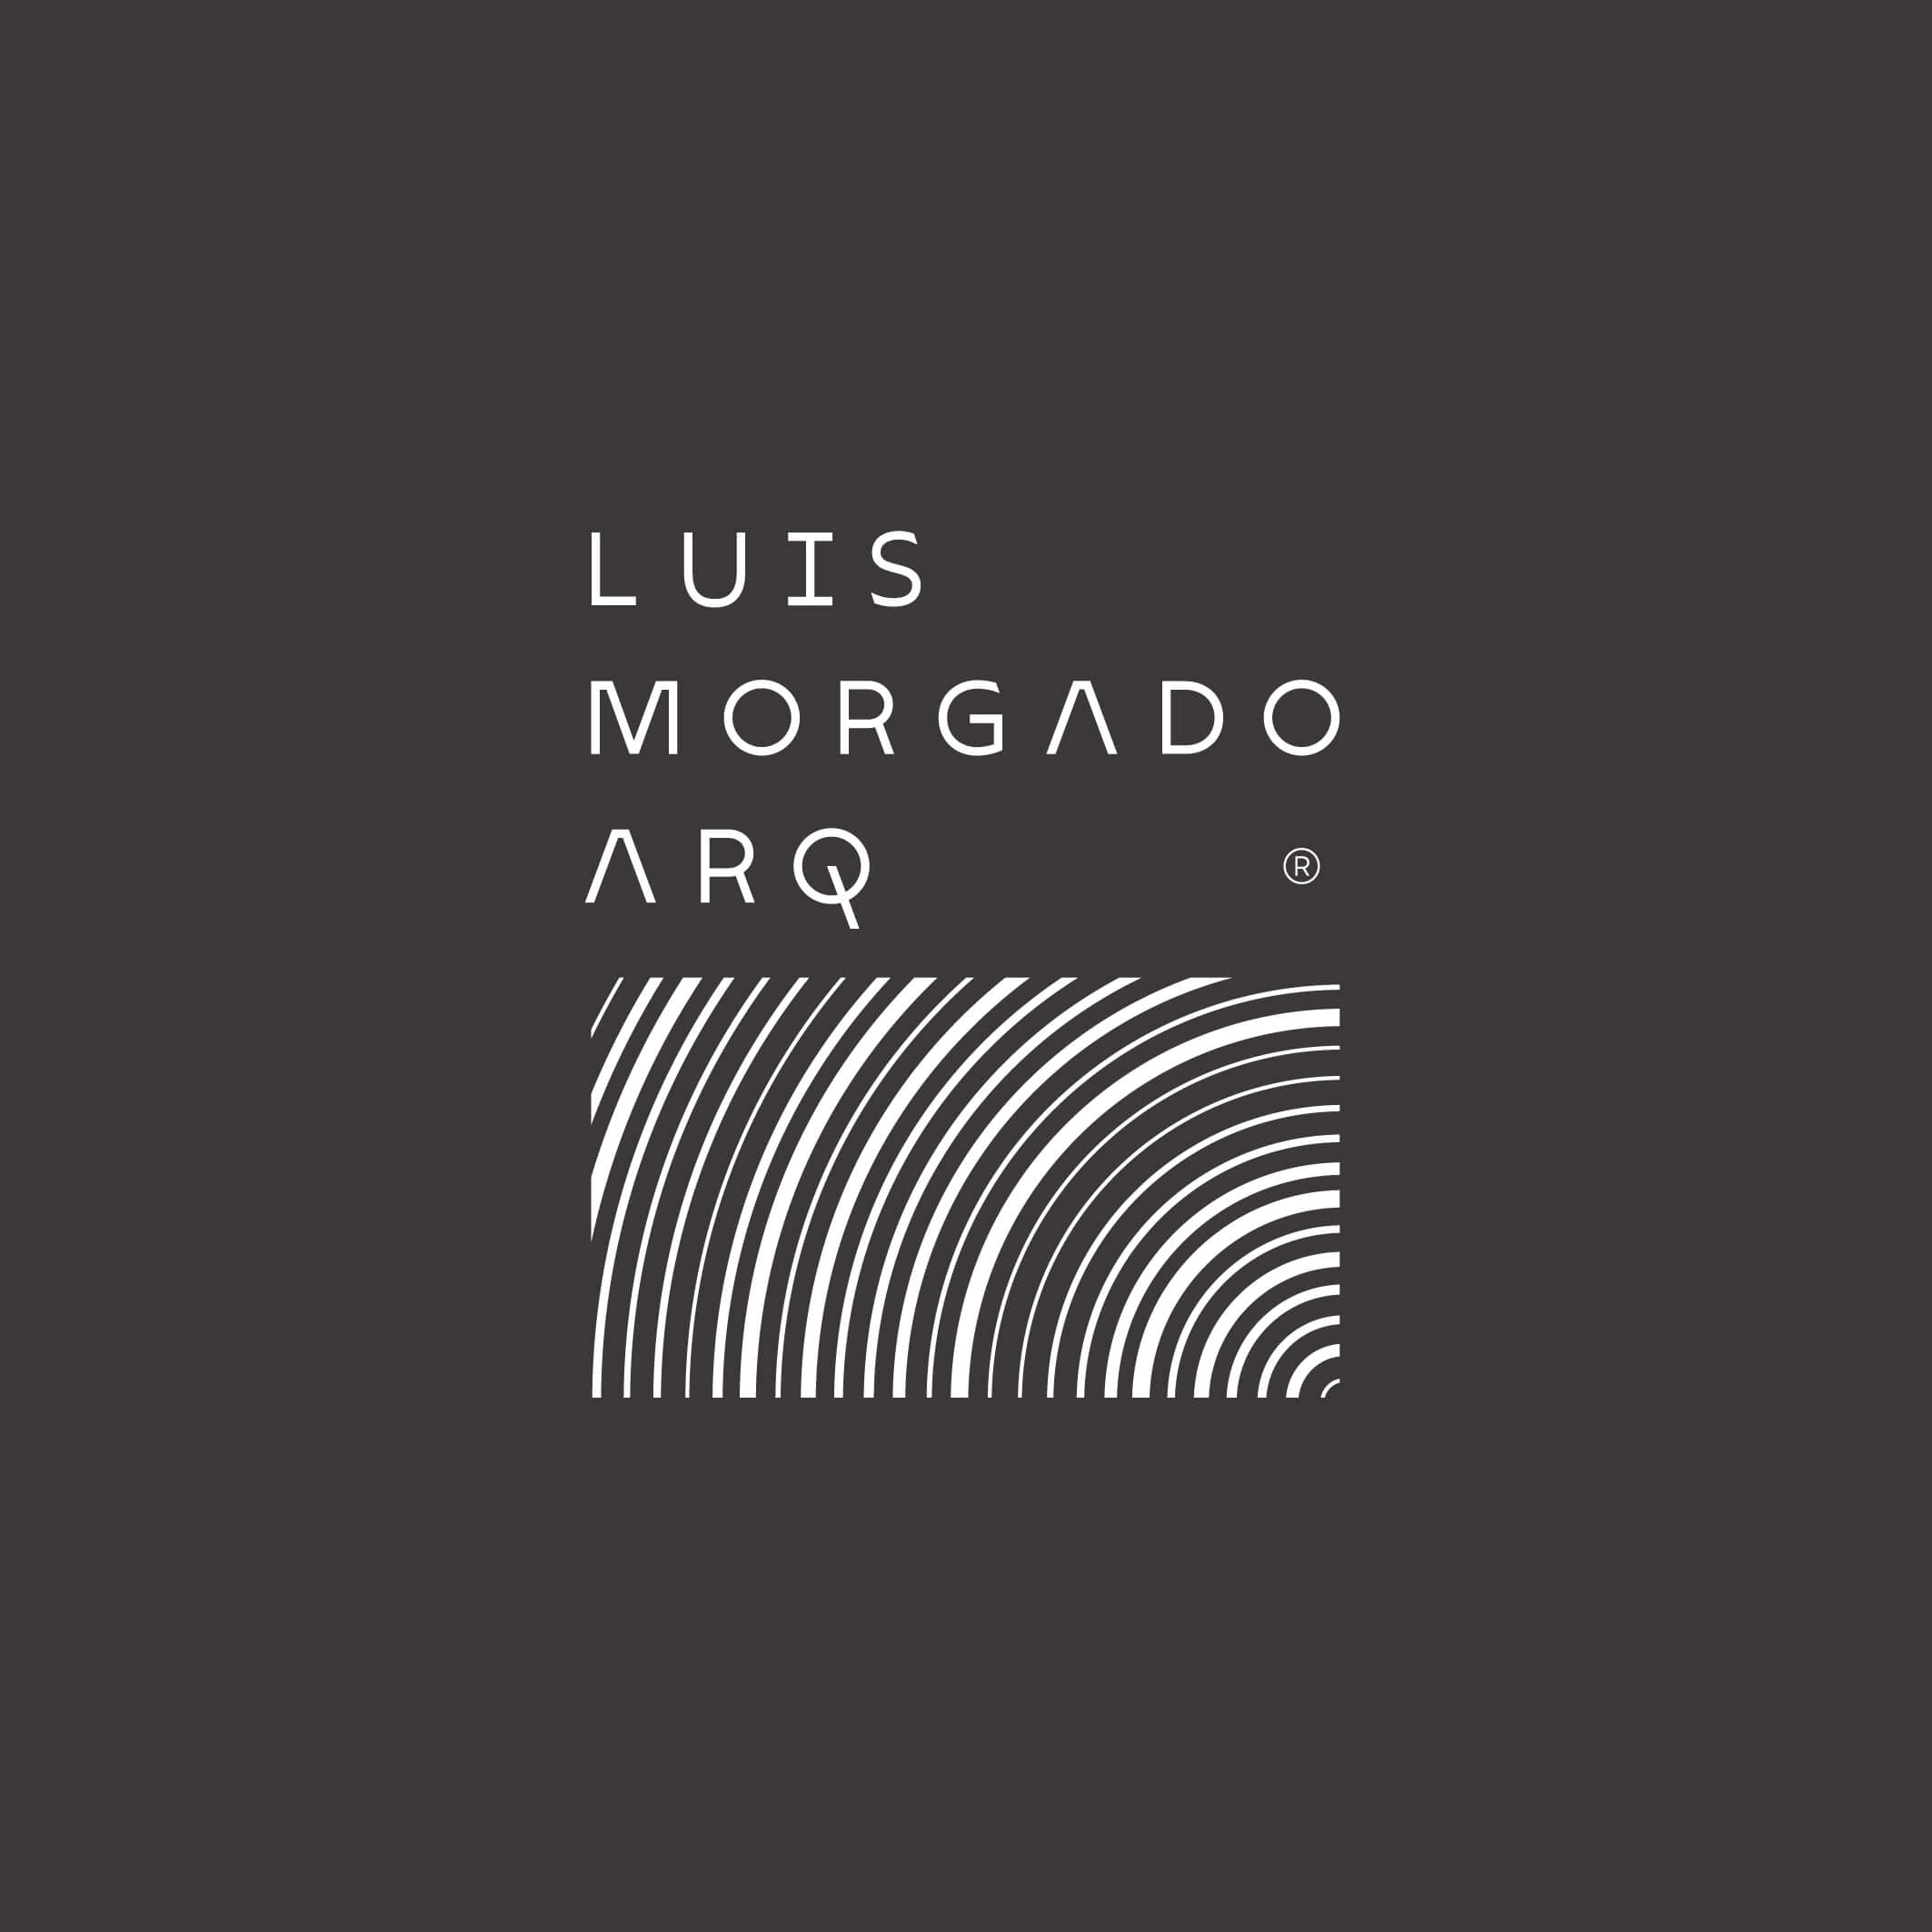 Luis Morgado Arq